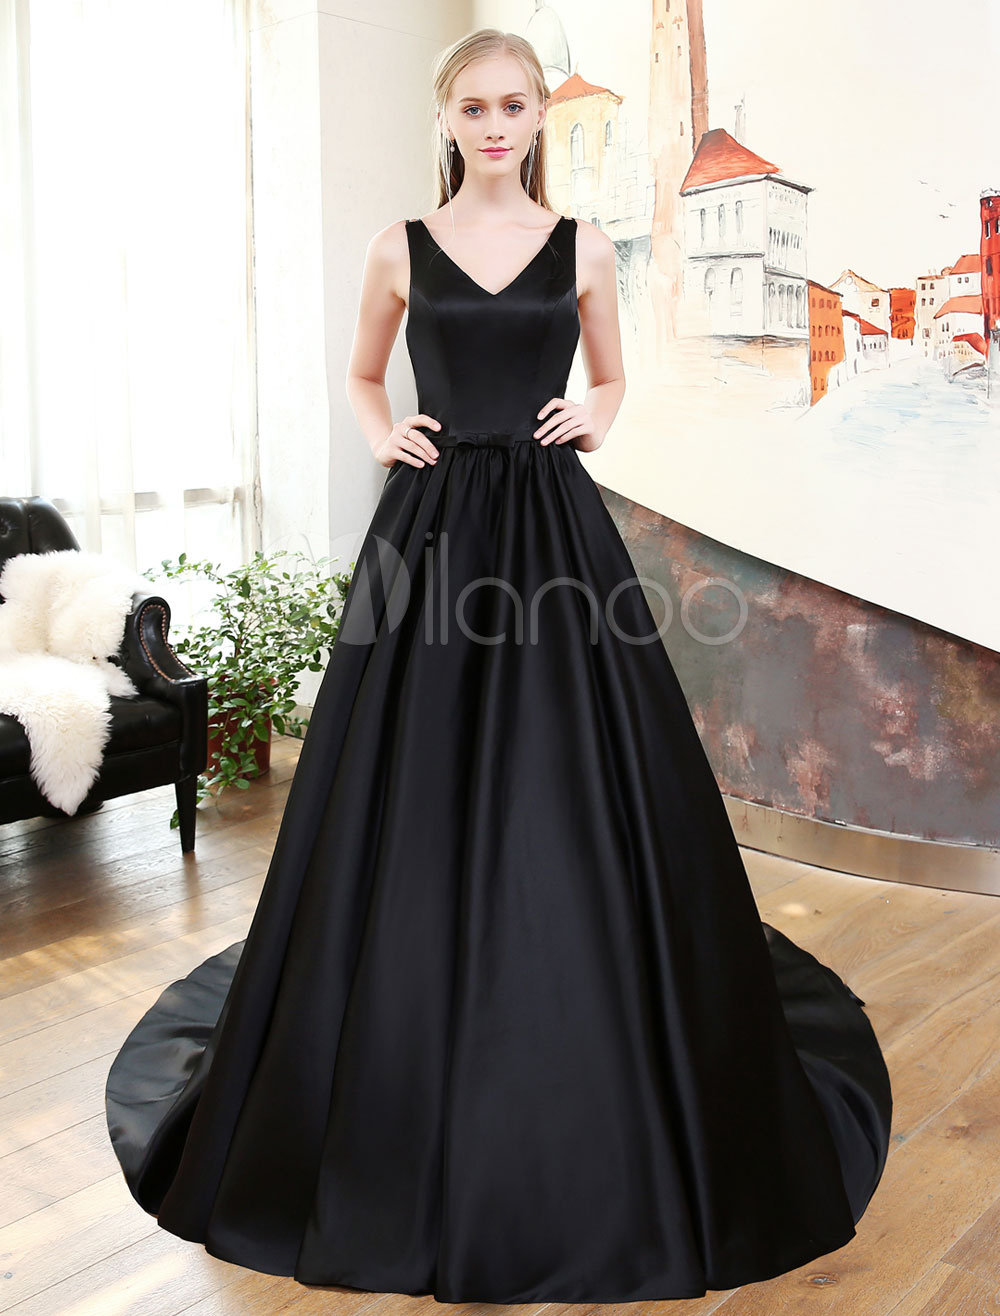 Buy Black Prom Dresses Long V Neck Satin Evening Dresses Cross Back Pleated Bow Sash Formal Dress for $197.09 in Milanoo store